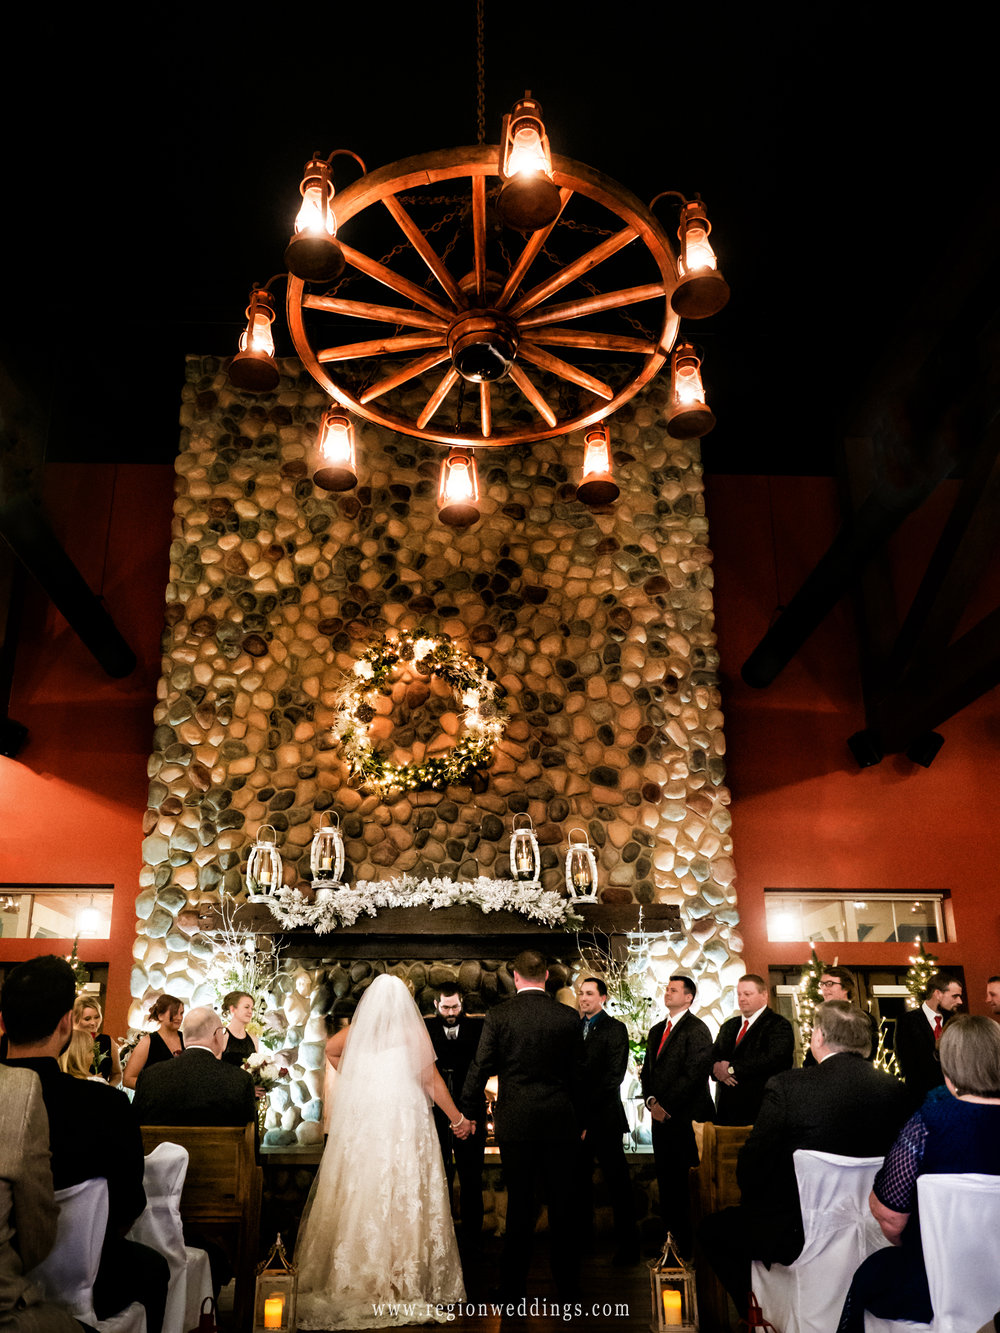 Winter wedding ceremony at Fair Oaks Farmhouse.